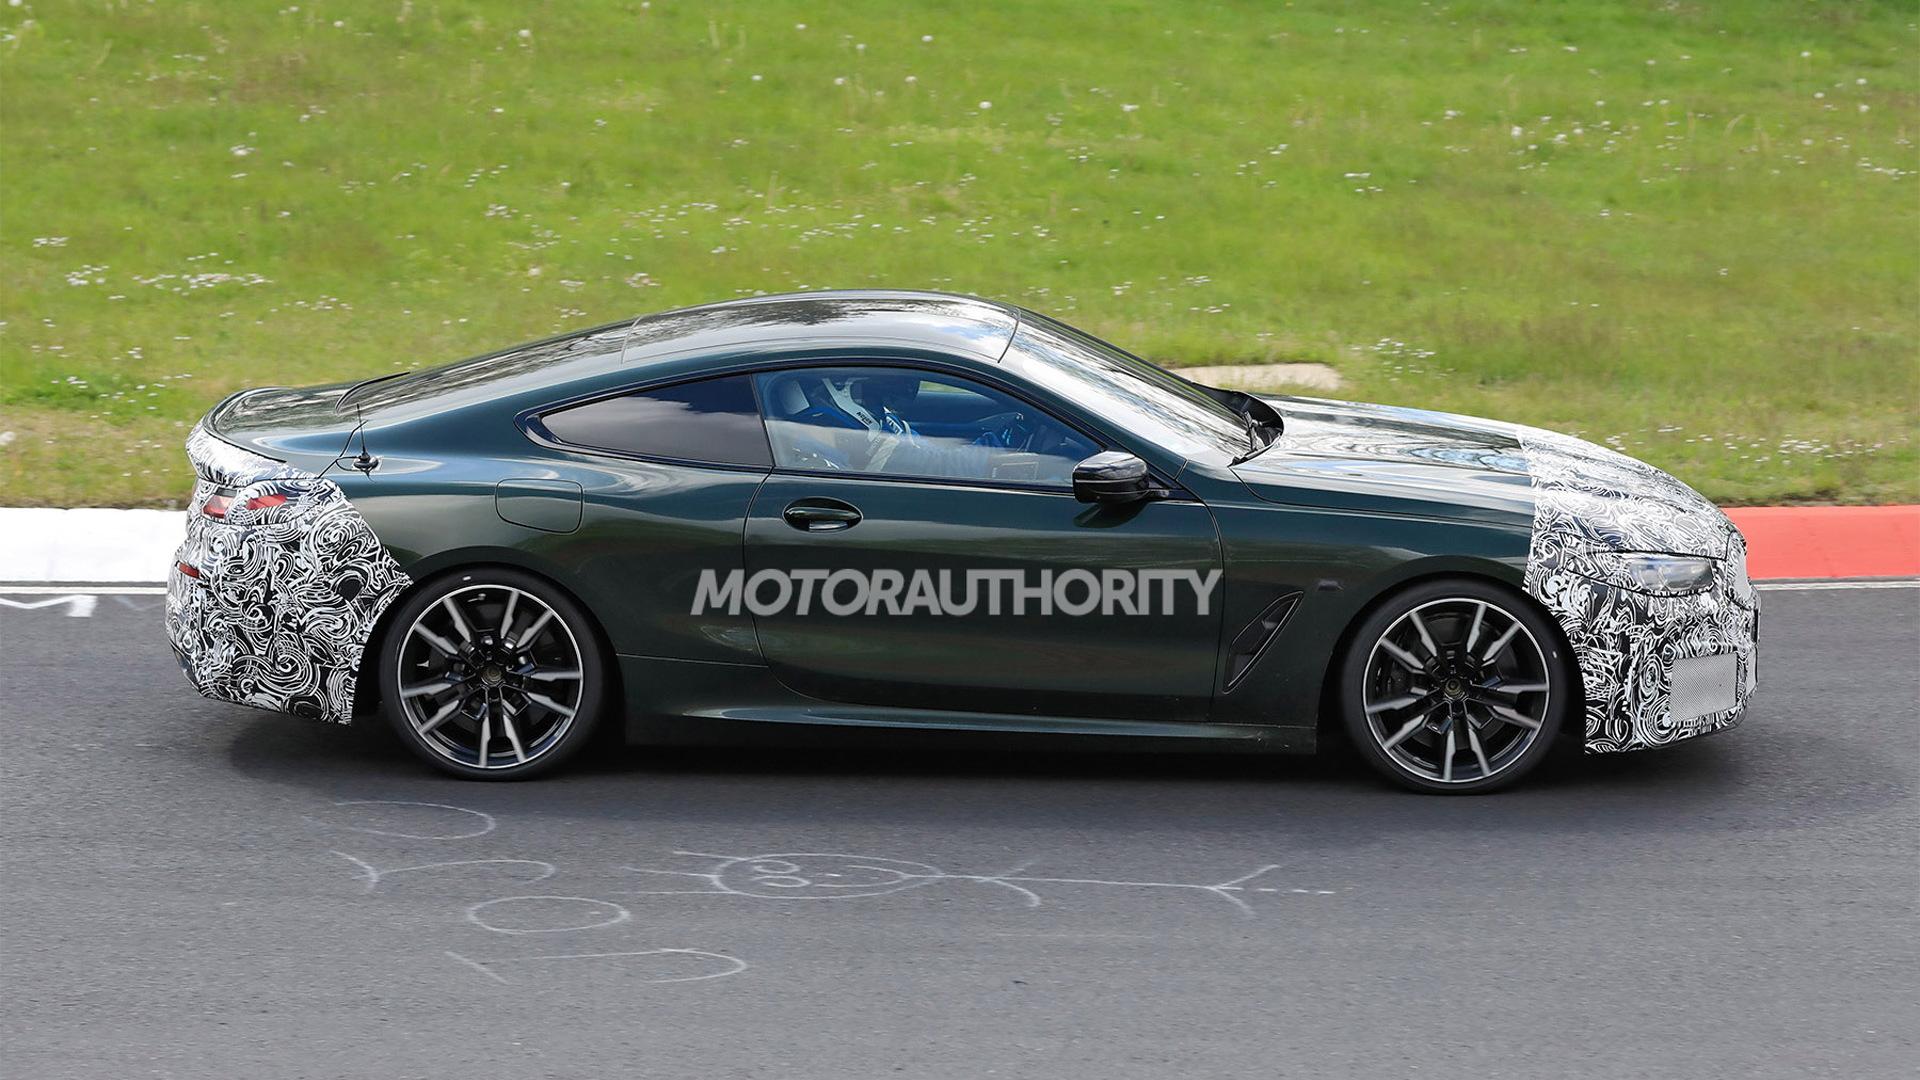 2023 BMW 8-Series facelift spy shots - Photo credit:S. Baldauf/SB-Medien